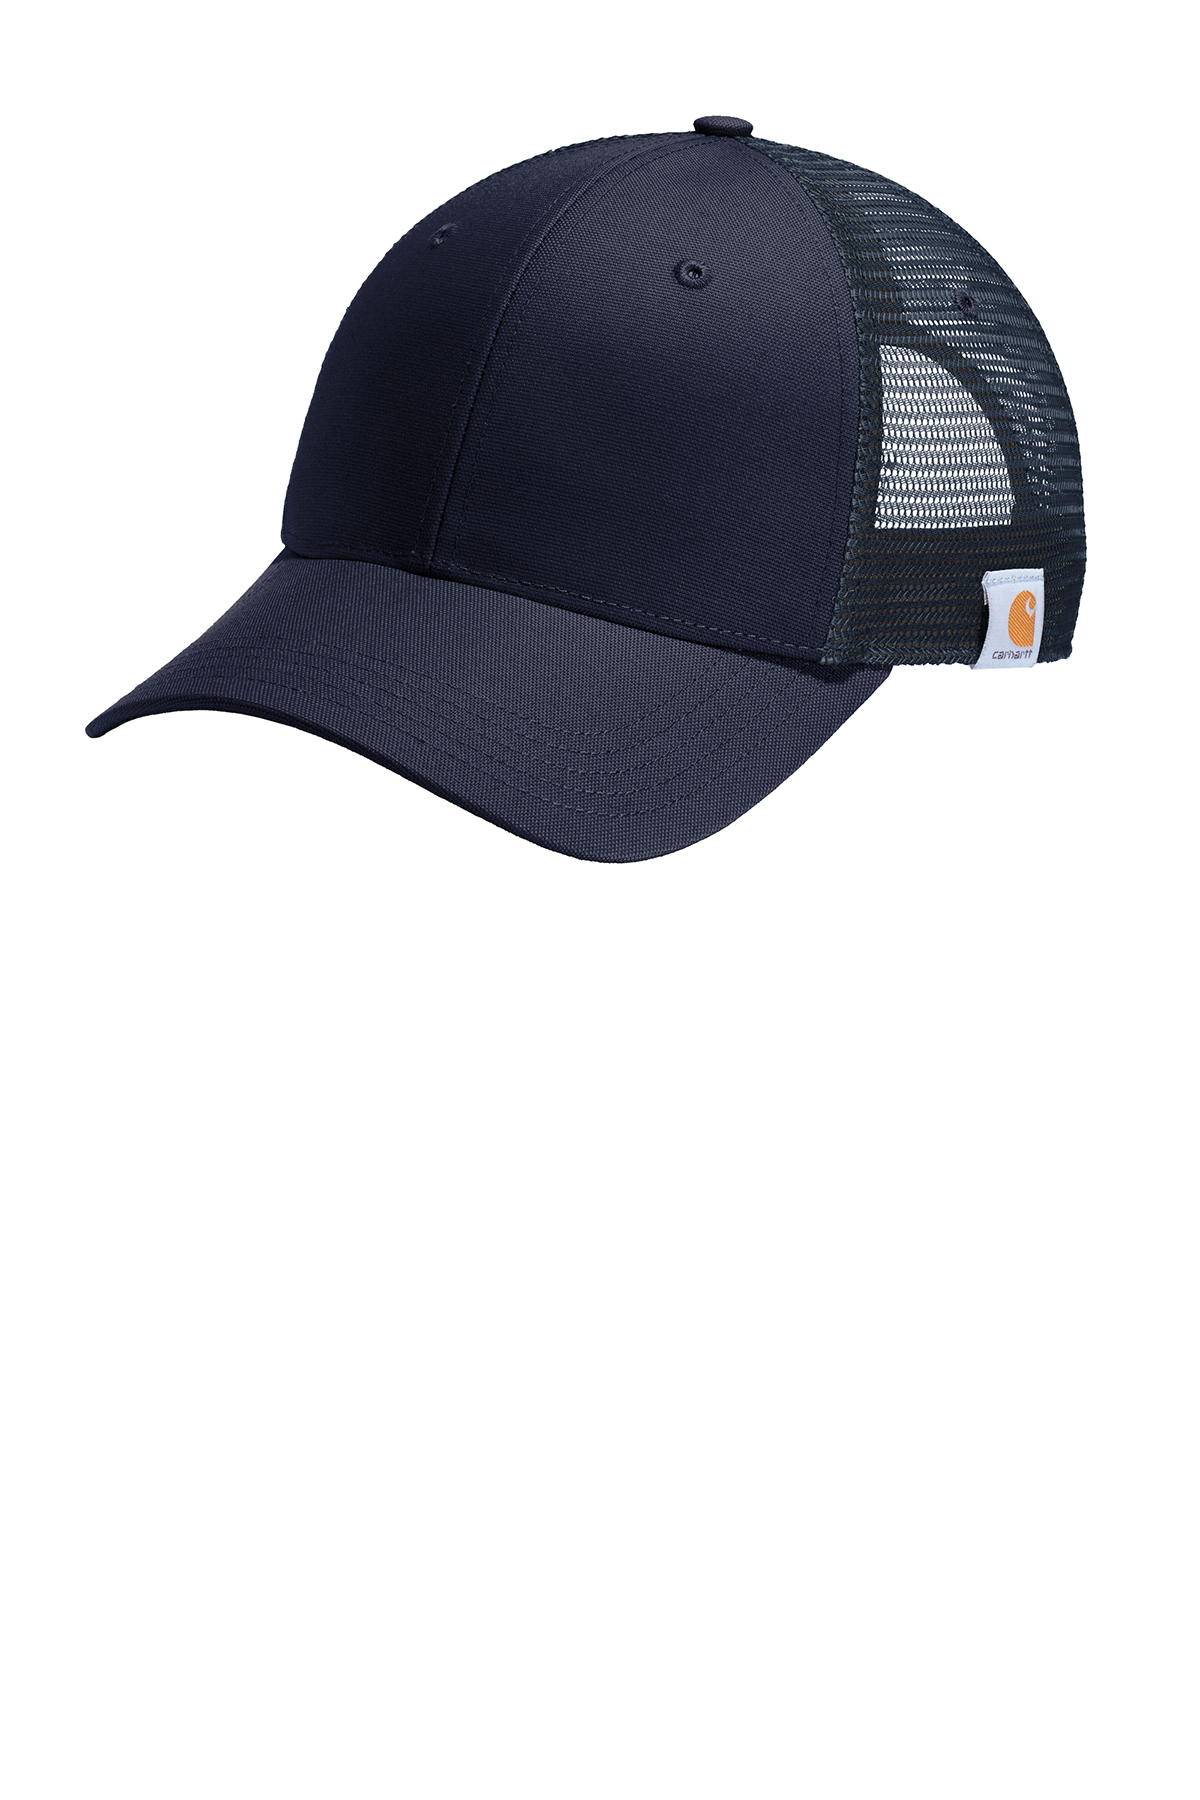 Carhartt ® Rugged Professional ™ Series Cap  d69099e18eec